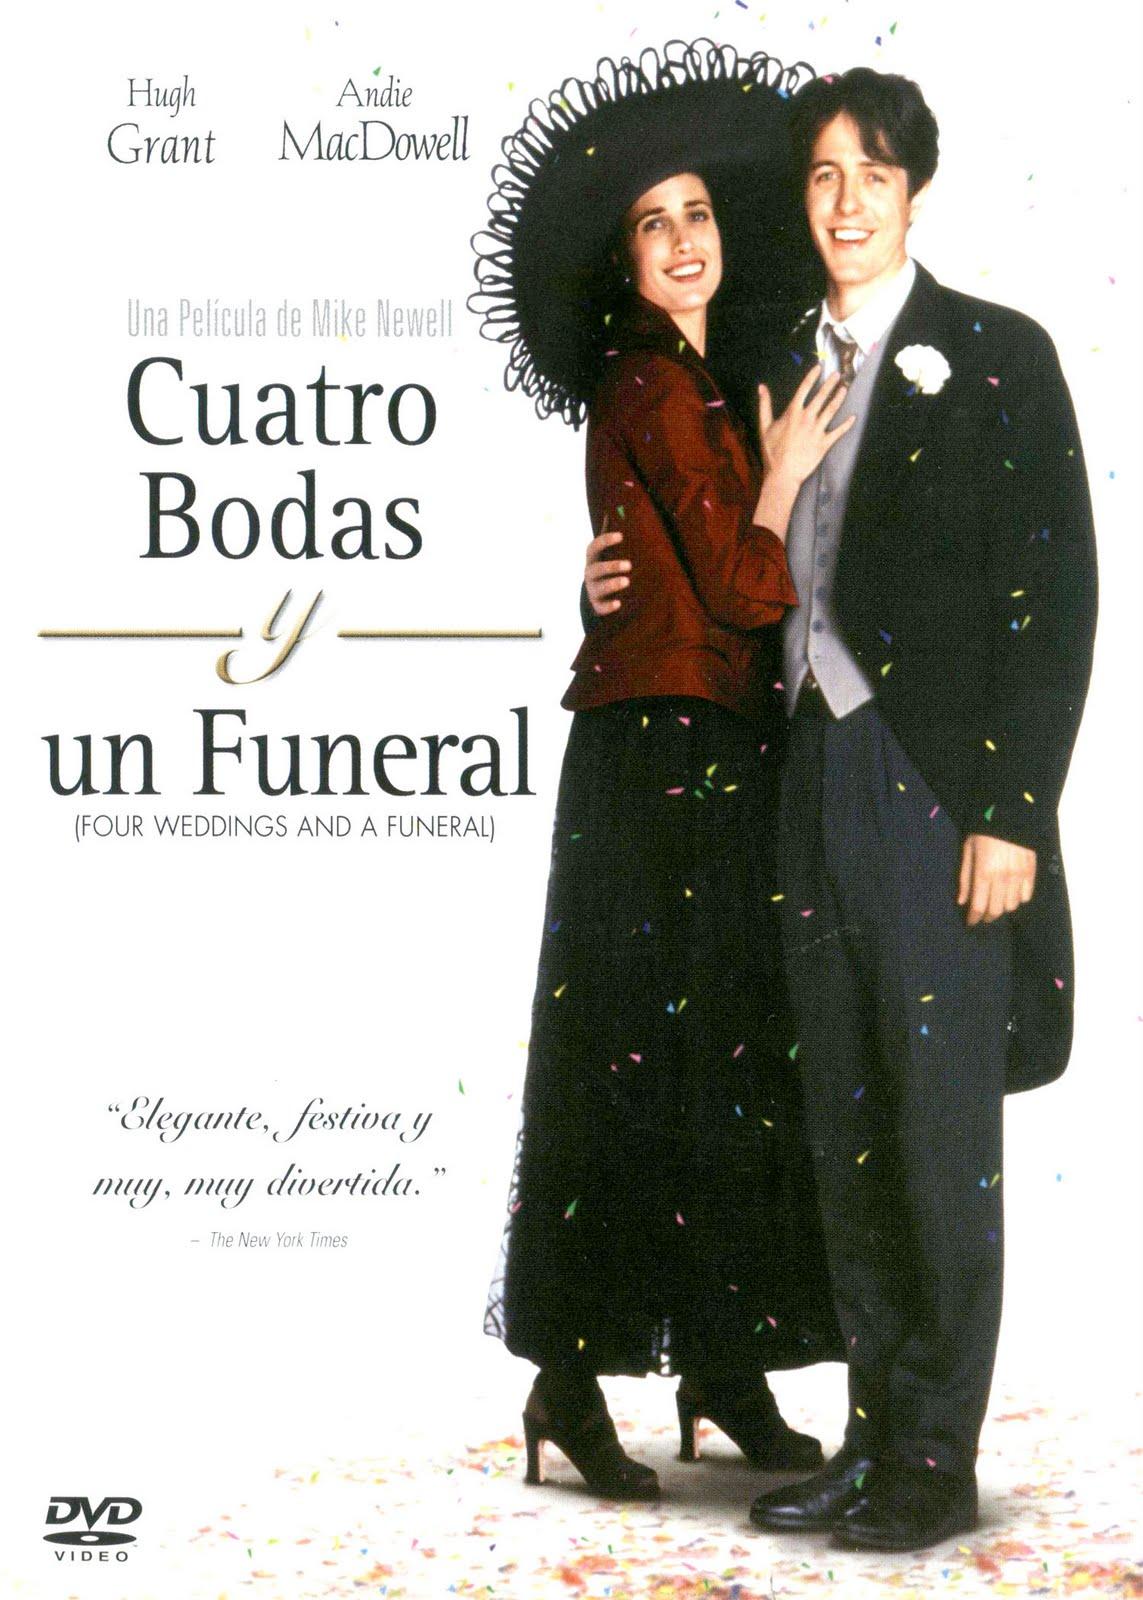 http://3.bp.blogspot.com/_eeyahRItsA8/TMjLcV9PPkI/AAAAAAAAAHk/puDoD_of0iM/s1600/Cuatro+Bodas+Y+Un+Funeral.jpg